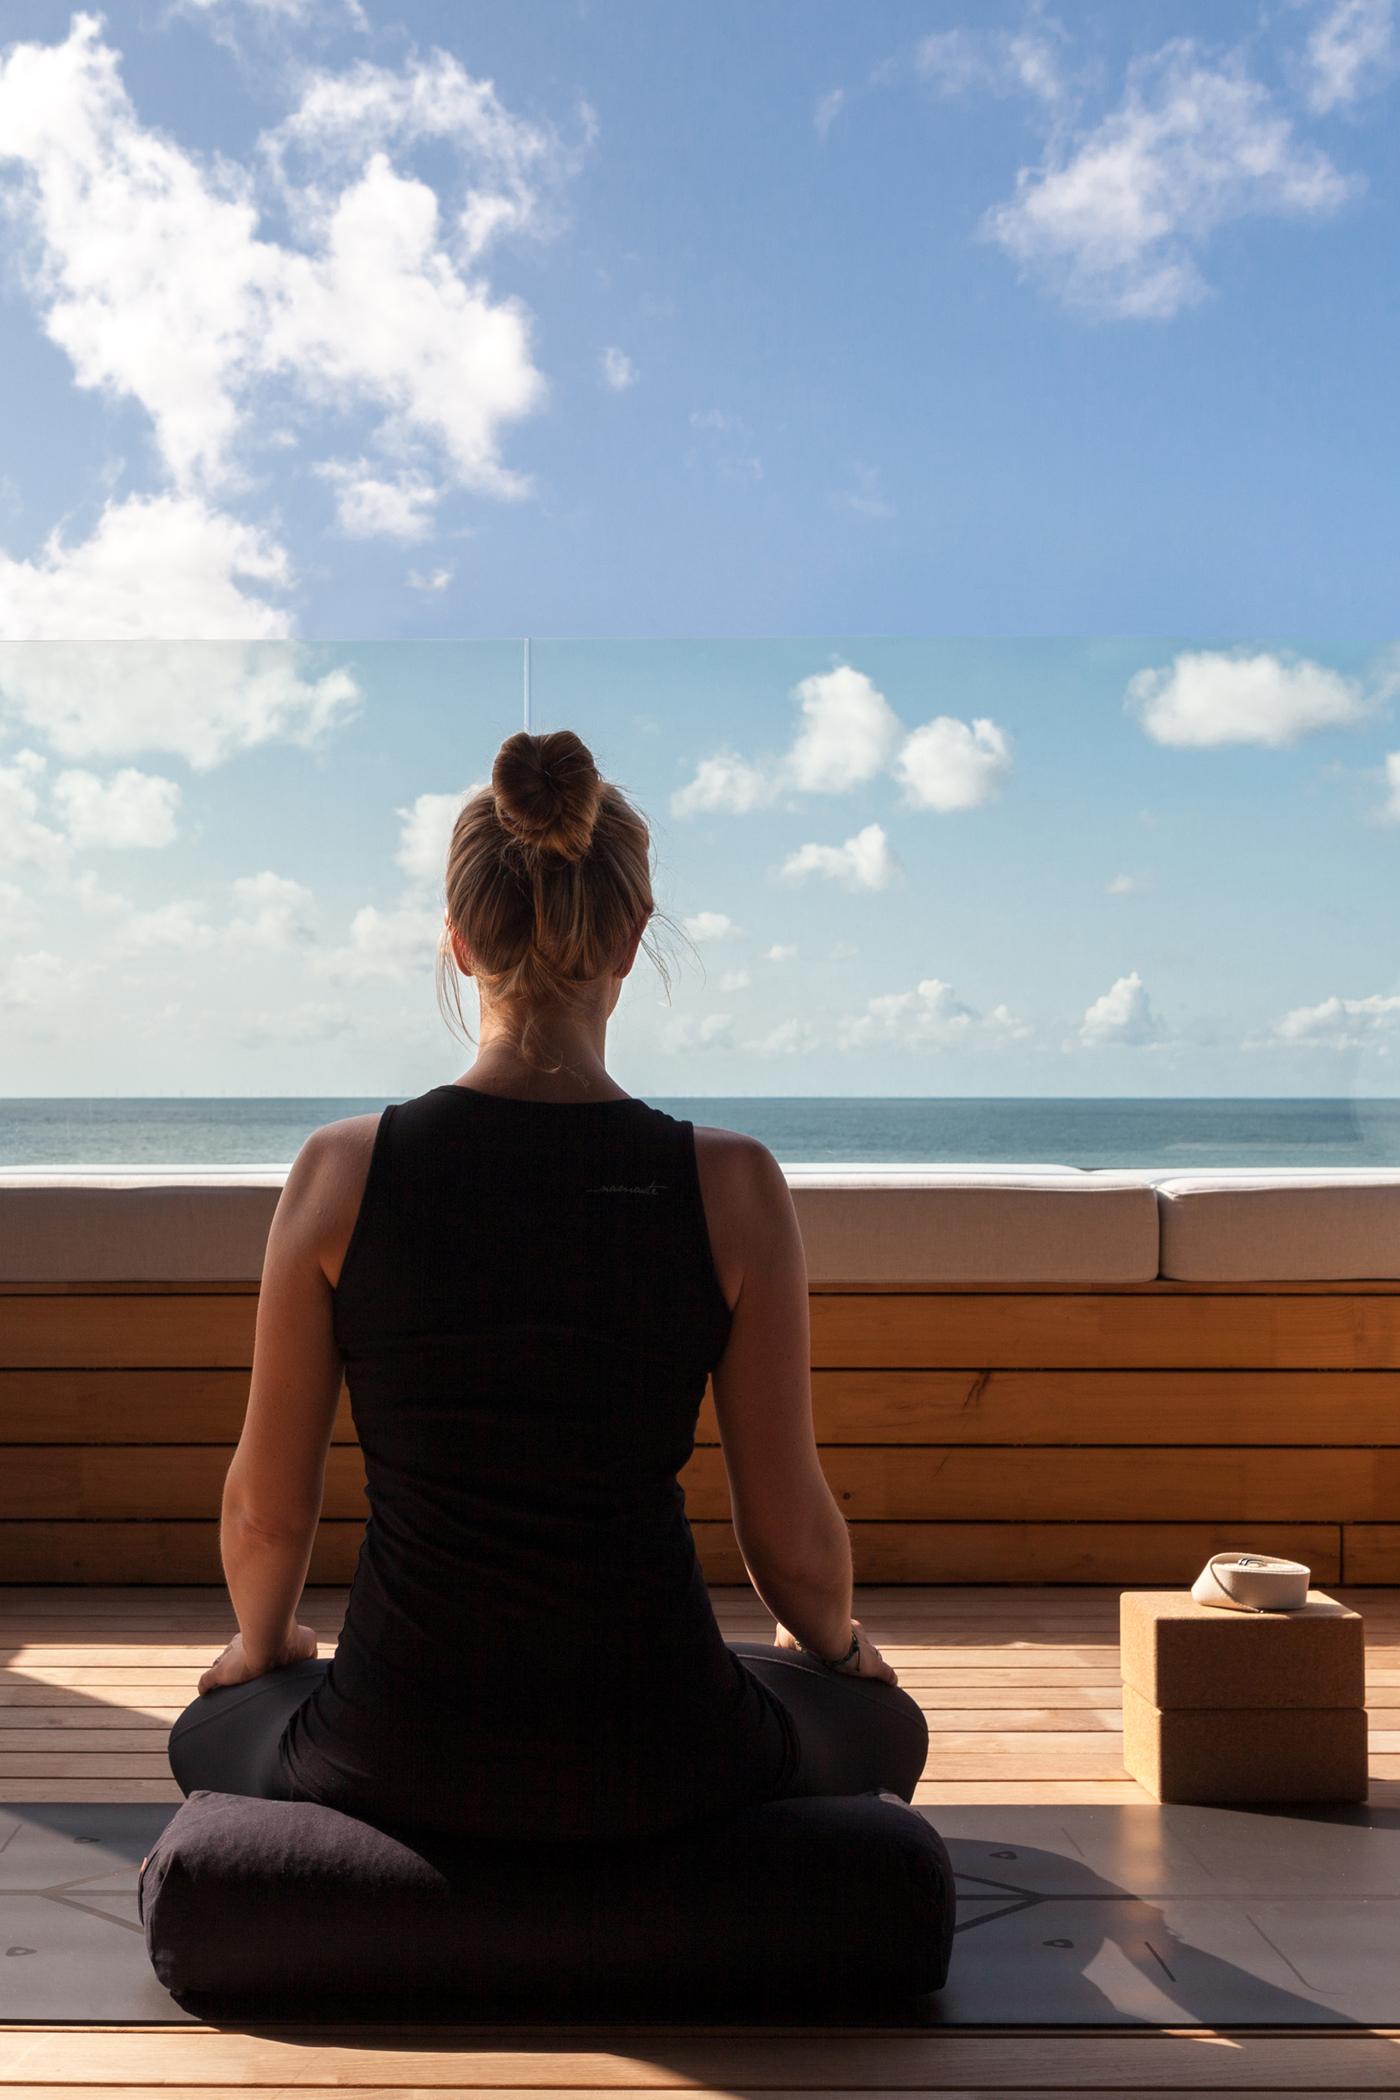 Imke Meditation Spa Lounge Wyn Strandhotel Sylt